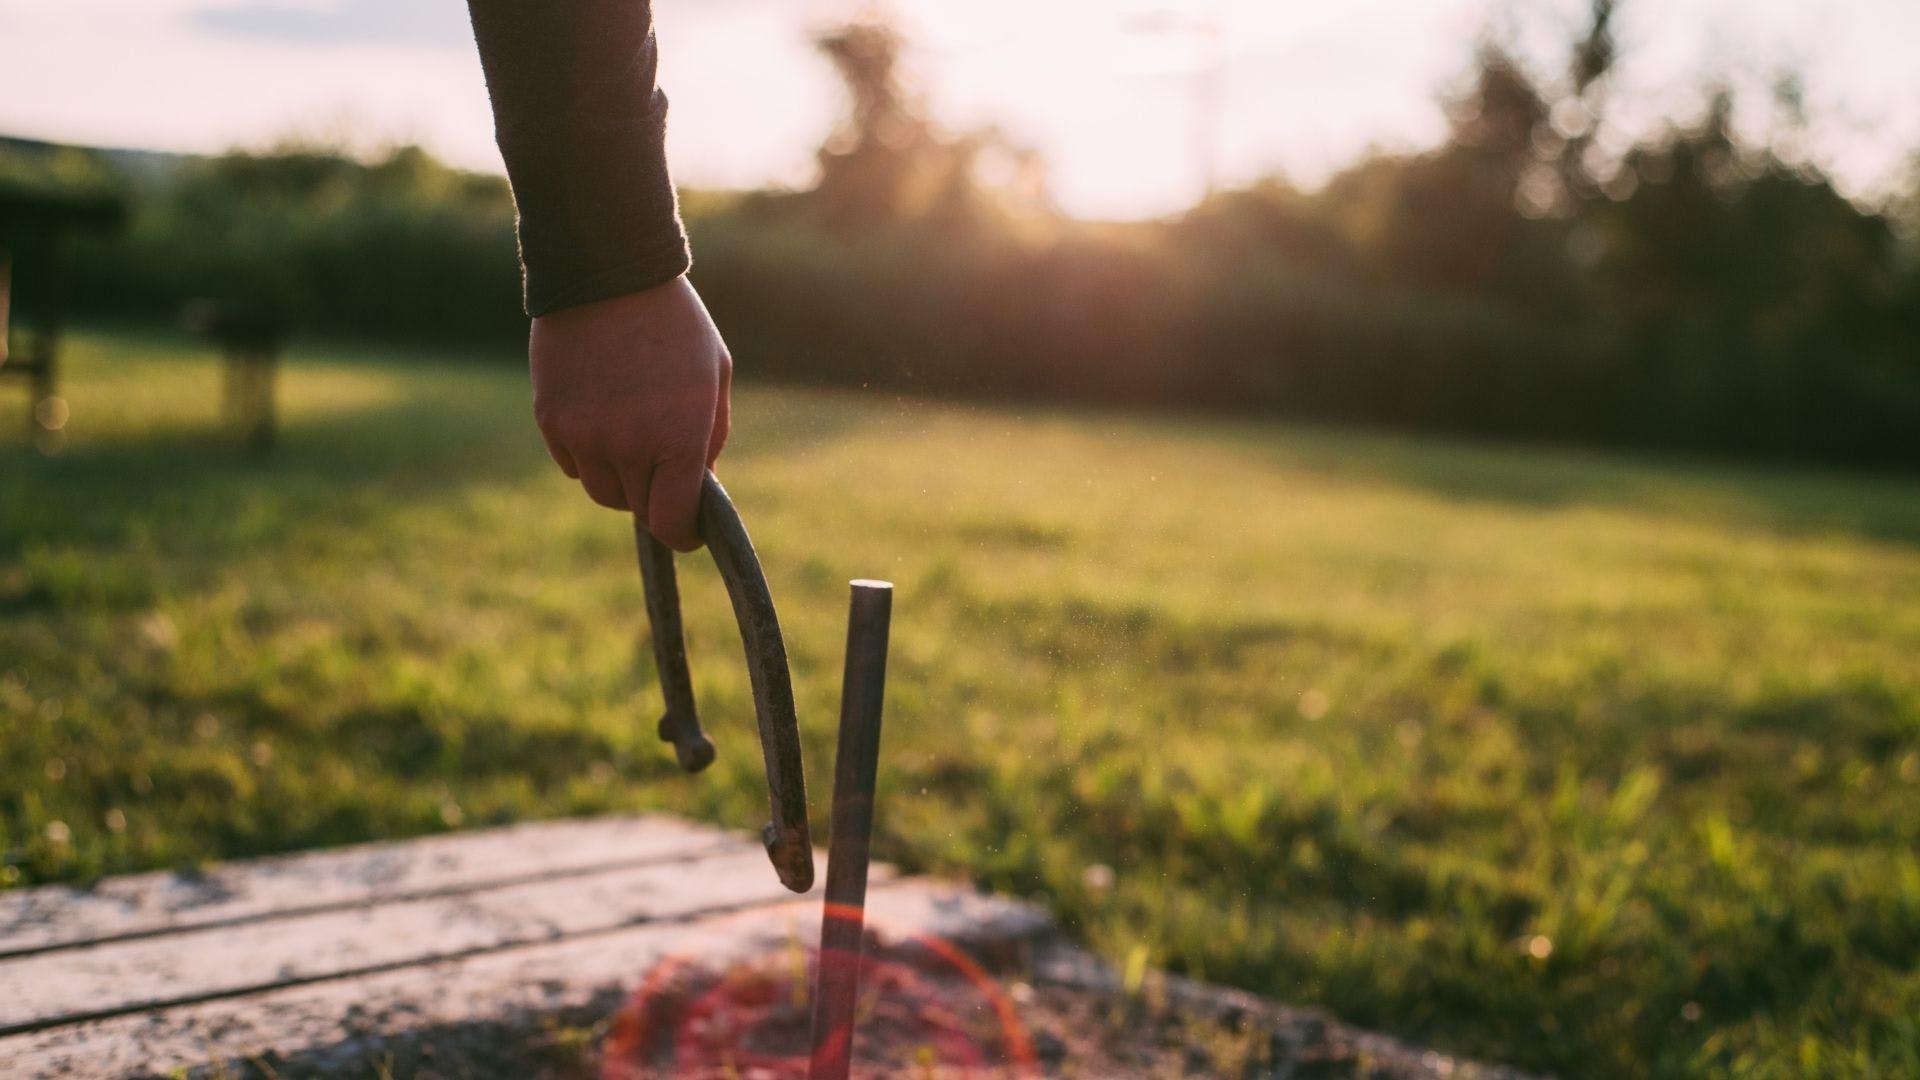 A hand holding a horseshoe